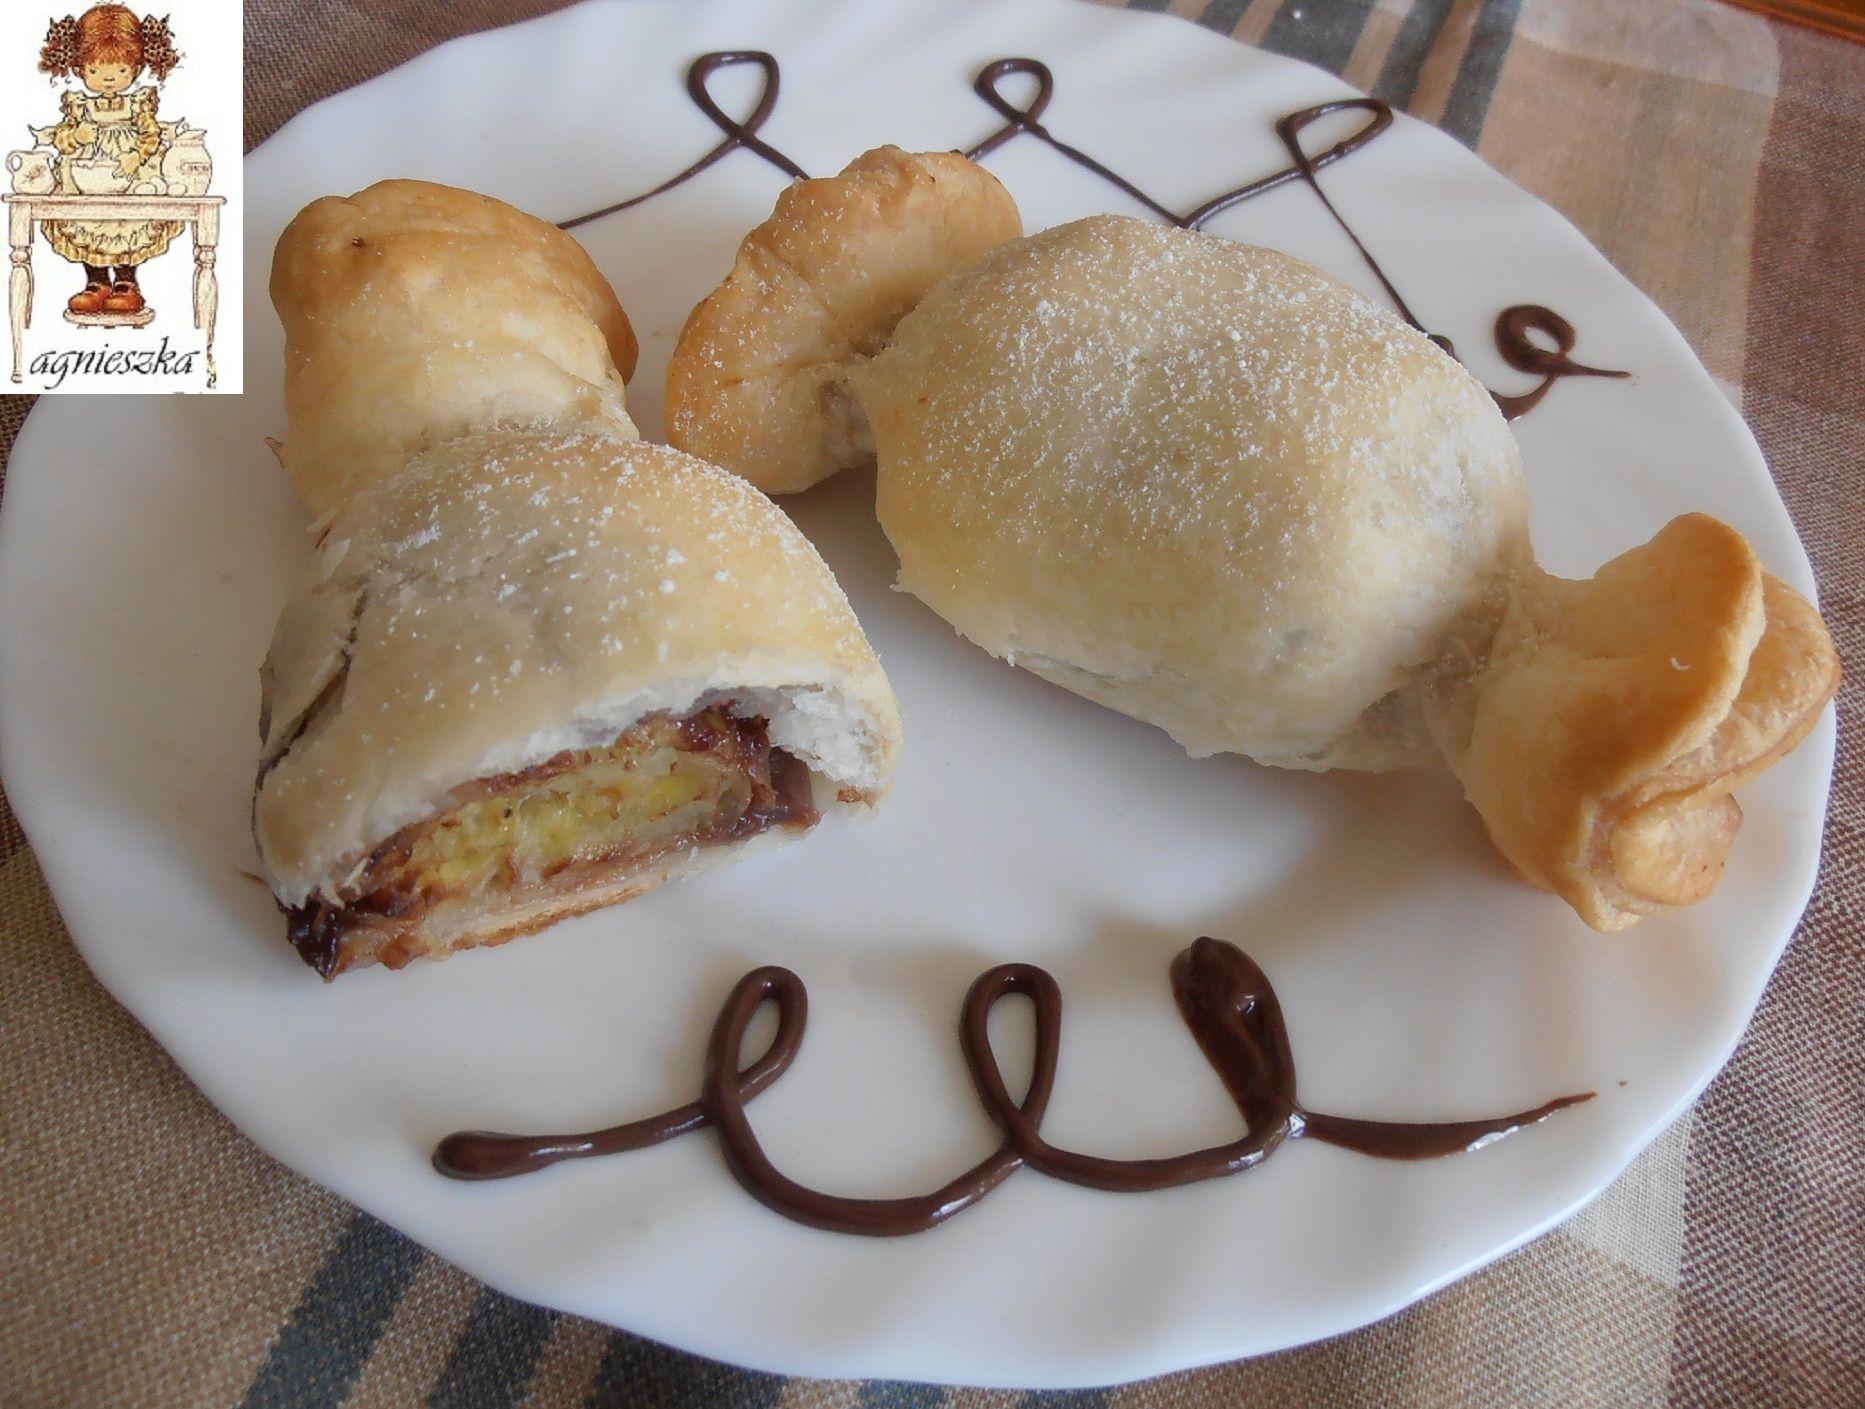 Caramelle di sfoglia con banana e cioccolato  from Agnesedus